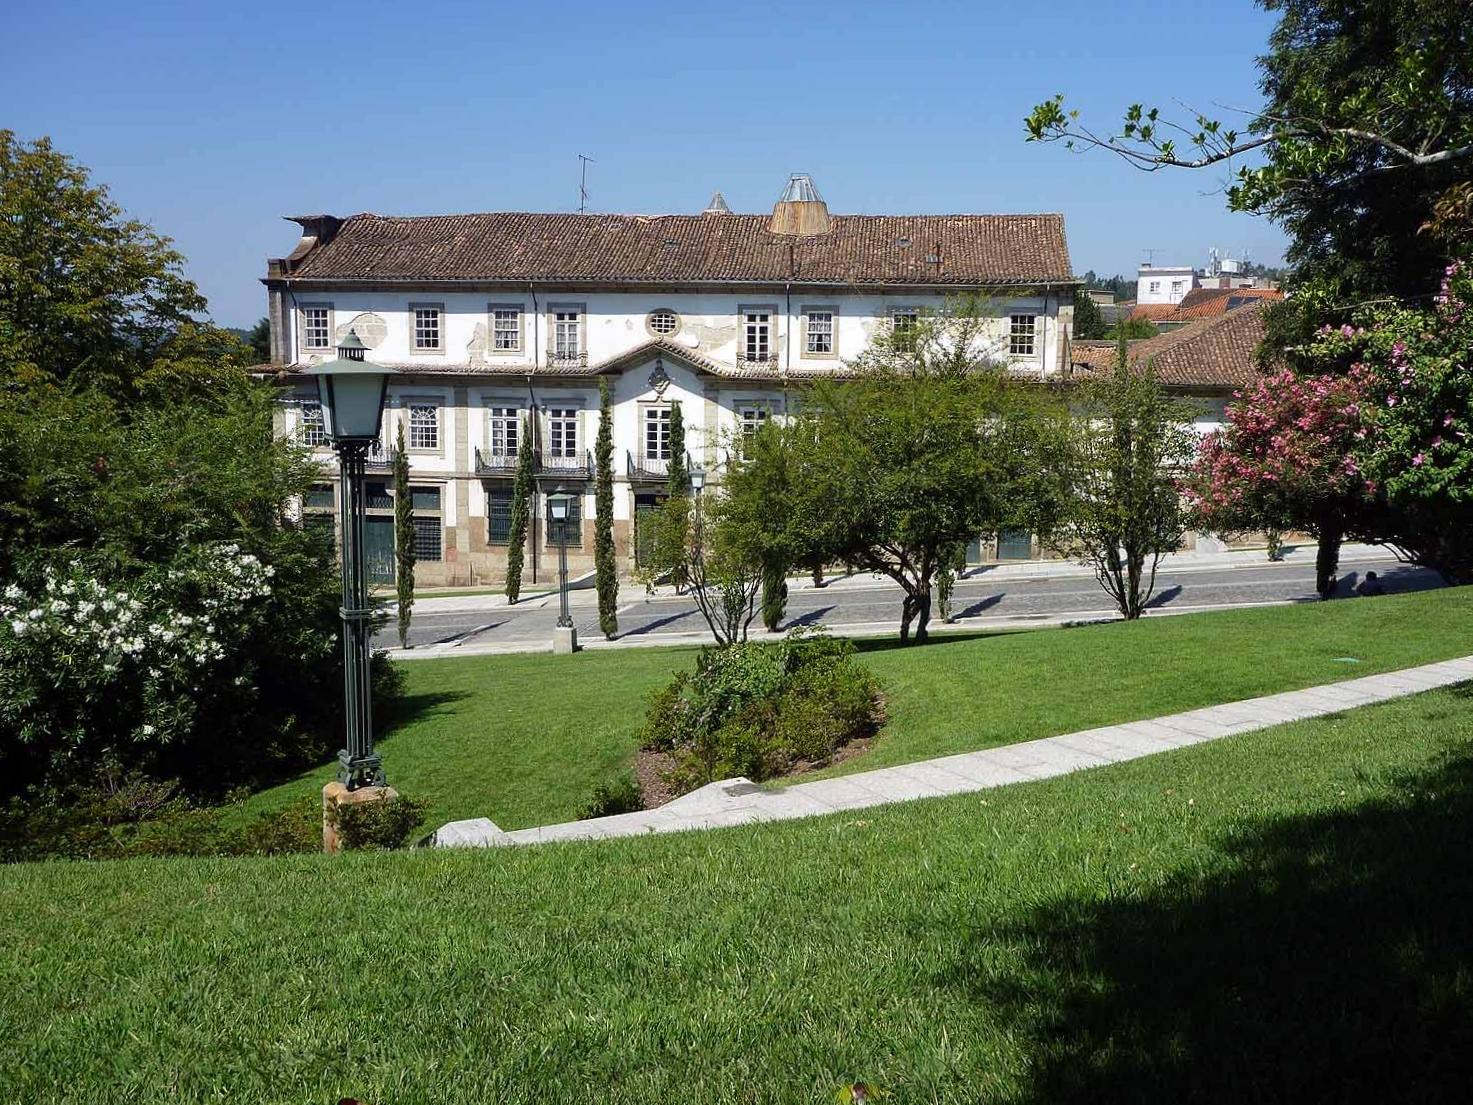 portugal-guimaraes-green-clean-streets.JPG